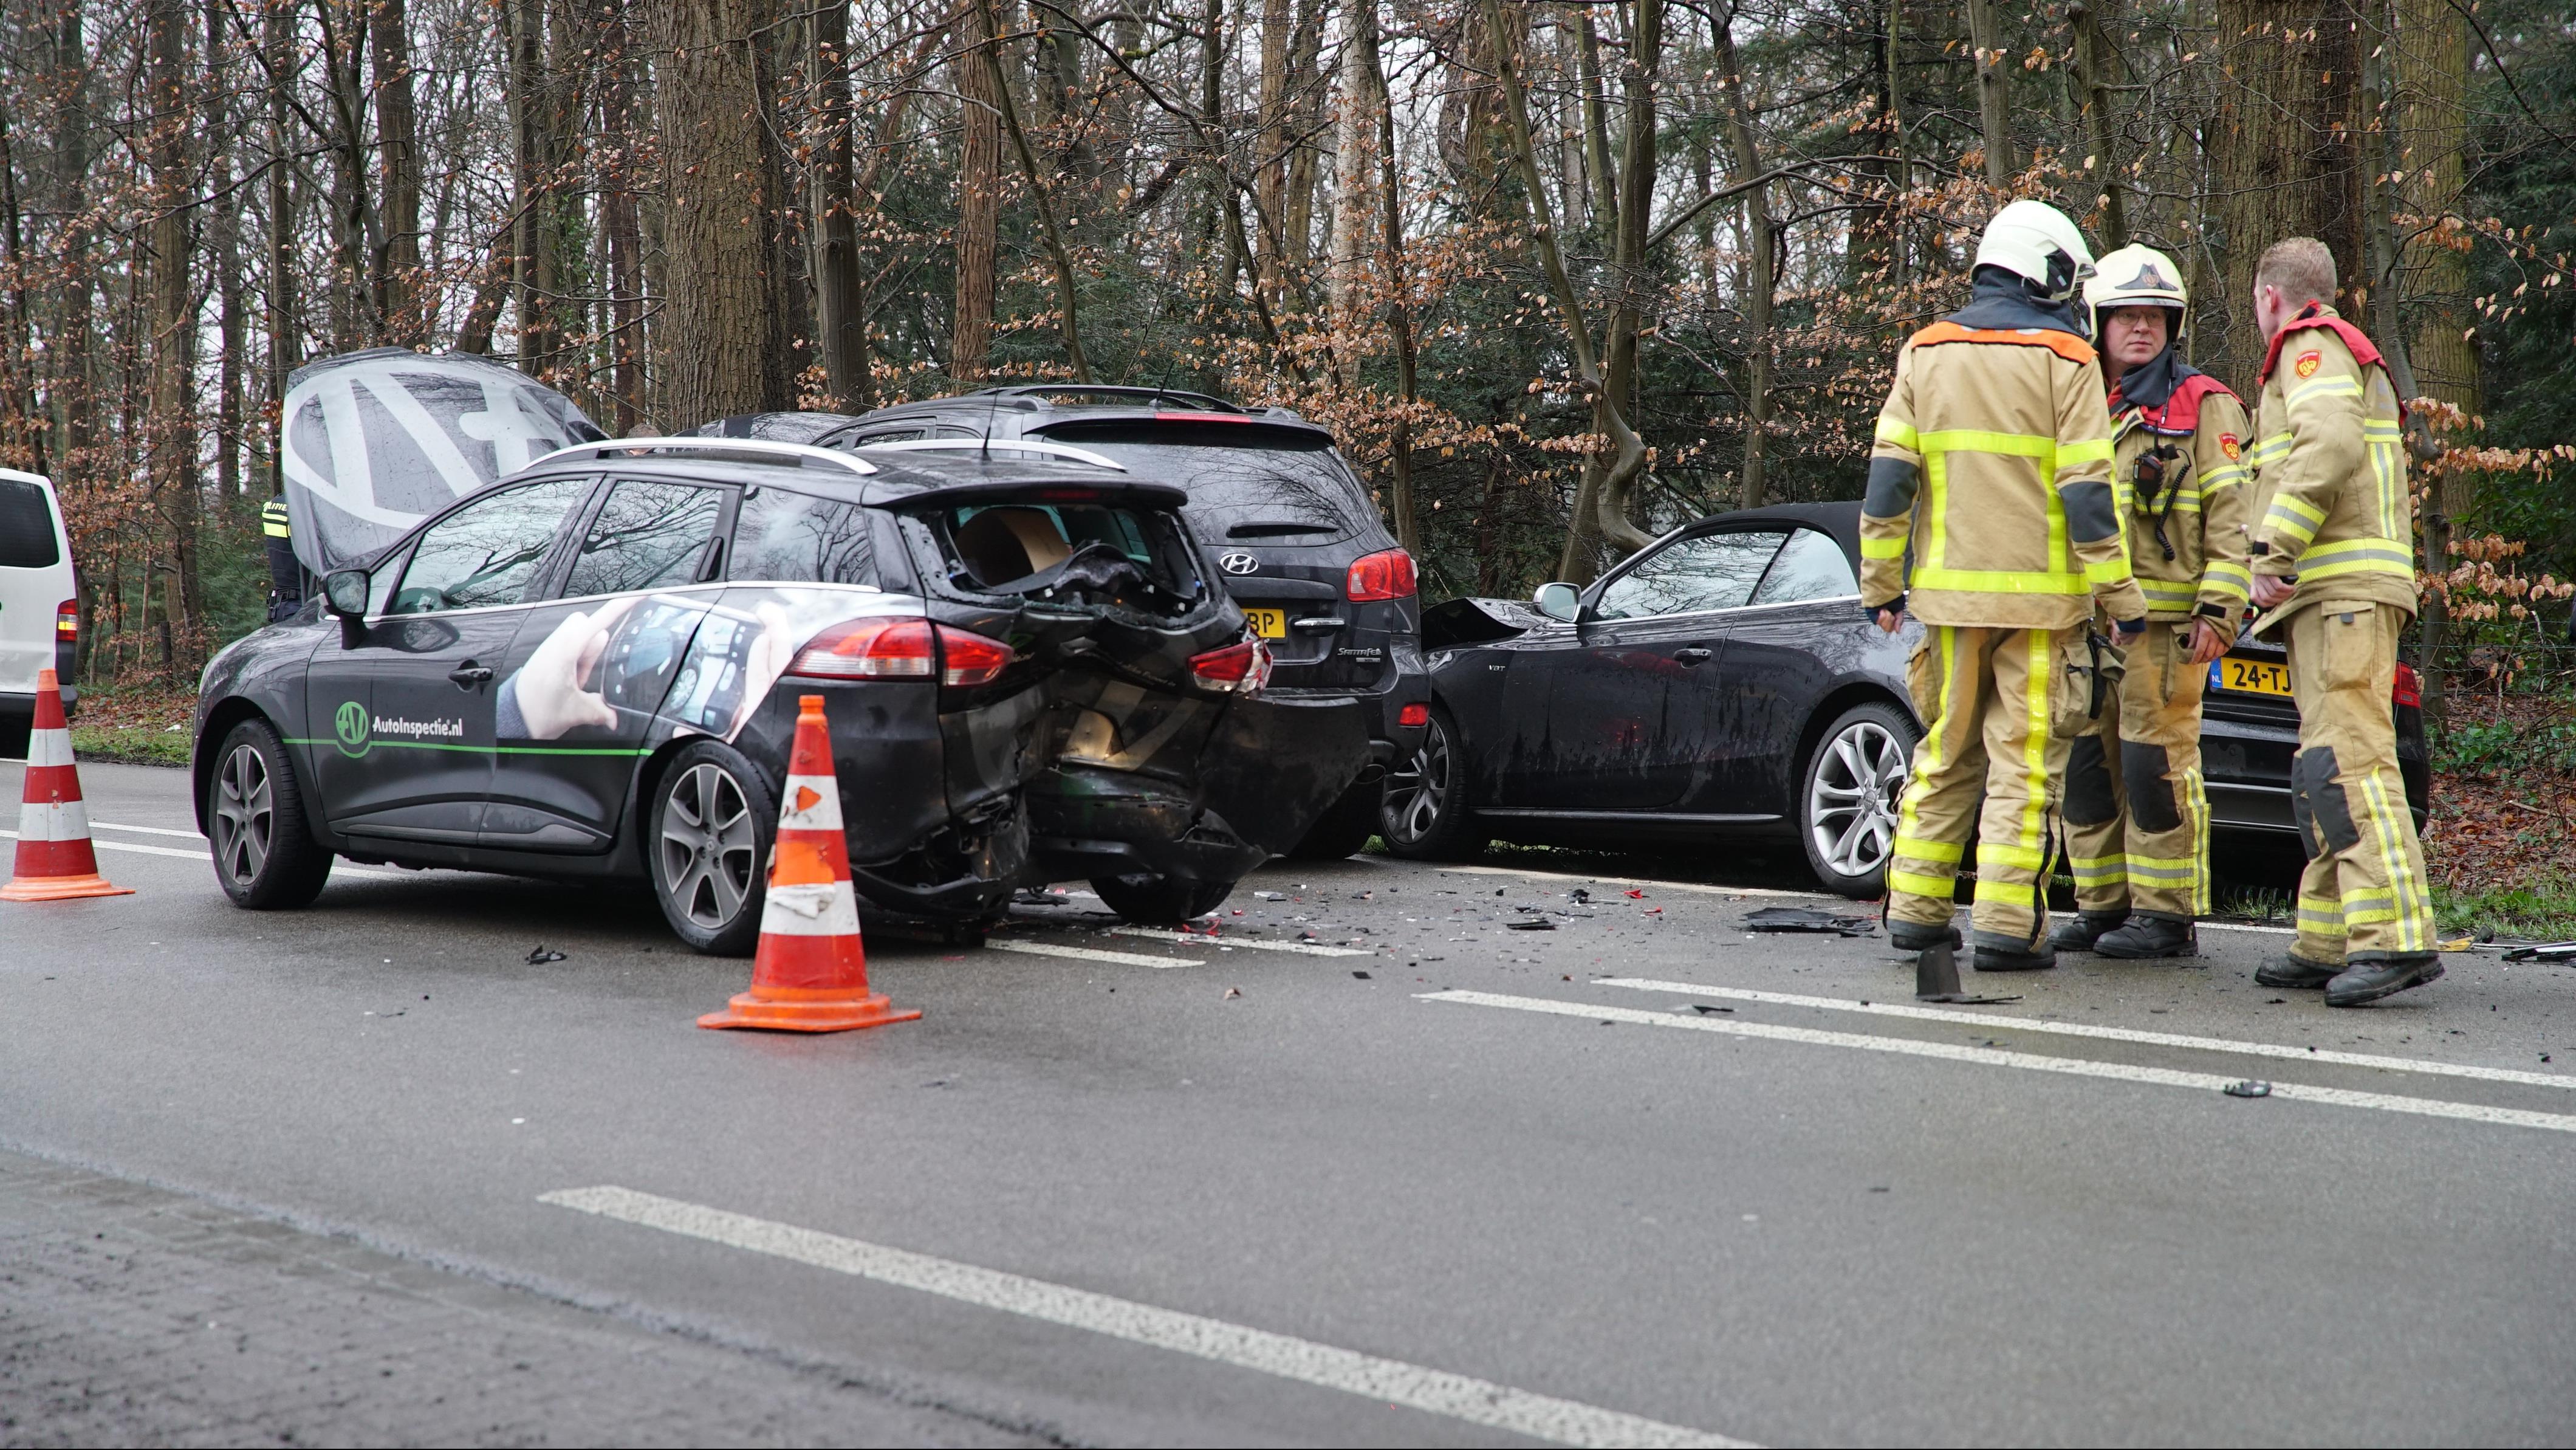 N348 tussen Deventer en Zutphen afgesloten na ernstig ongeval.